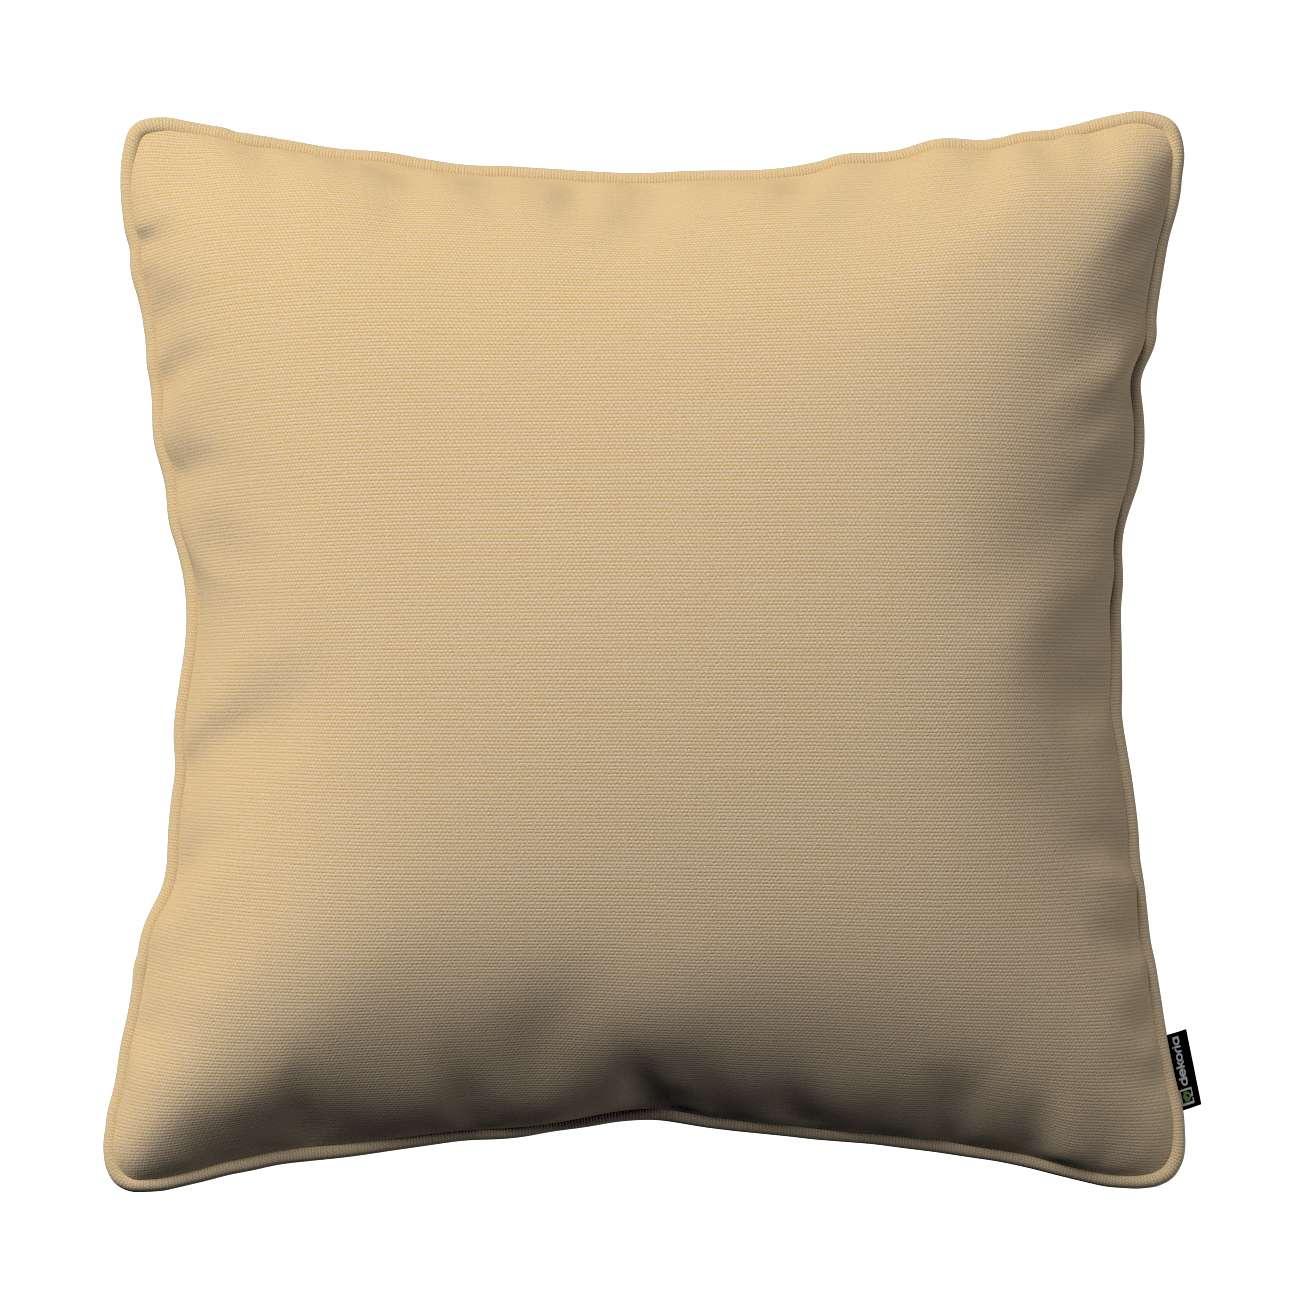 Kissenhülle Gabi mit Paspel 45 x 45 cm von der Kollektion Cotton Panama, Stoff: 702-01